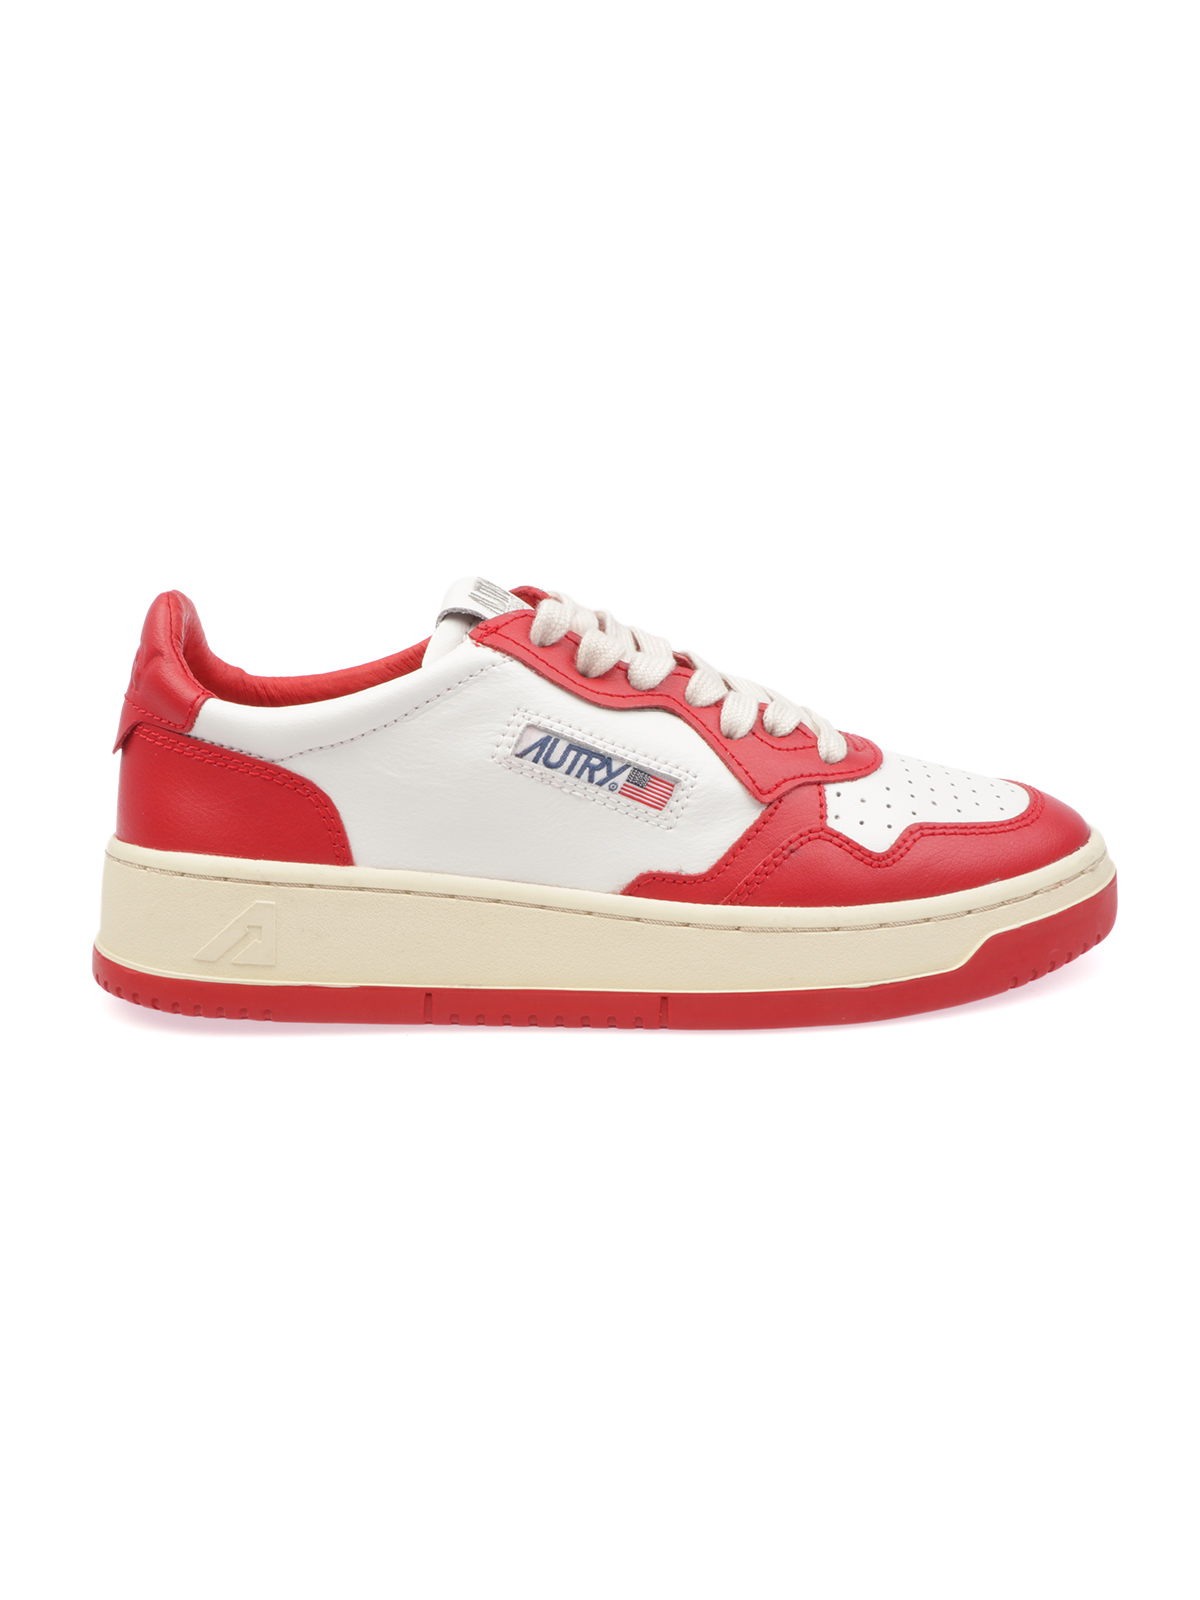 Immagine di Autry | Footwear Sneakers